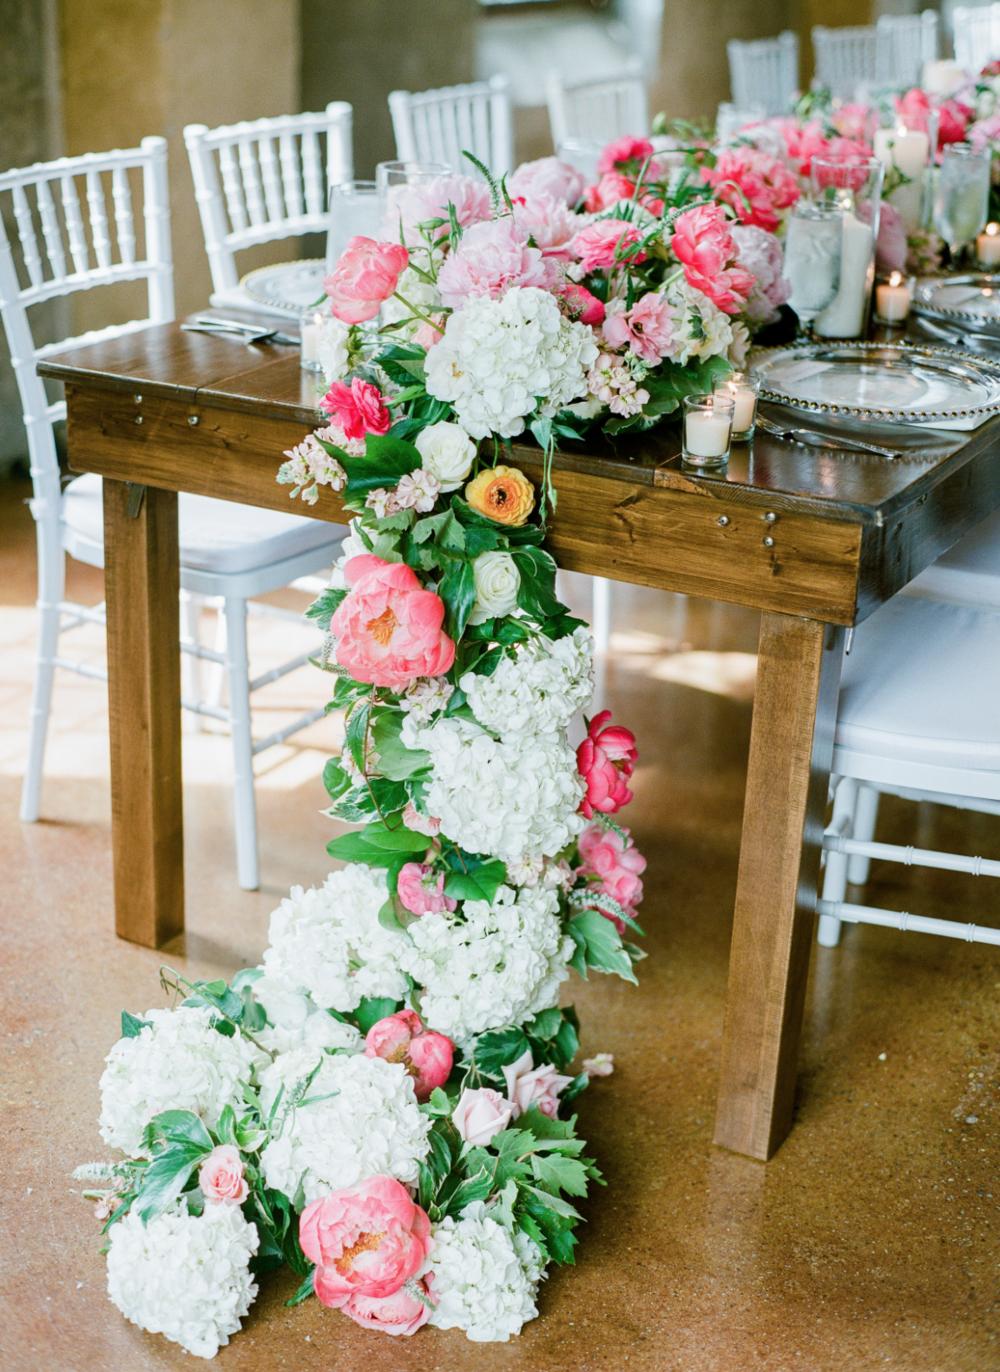 Olde Dobbin Station Coral Wedding Maxit Flower Design, Kelli Durham 2.png